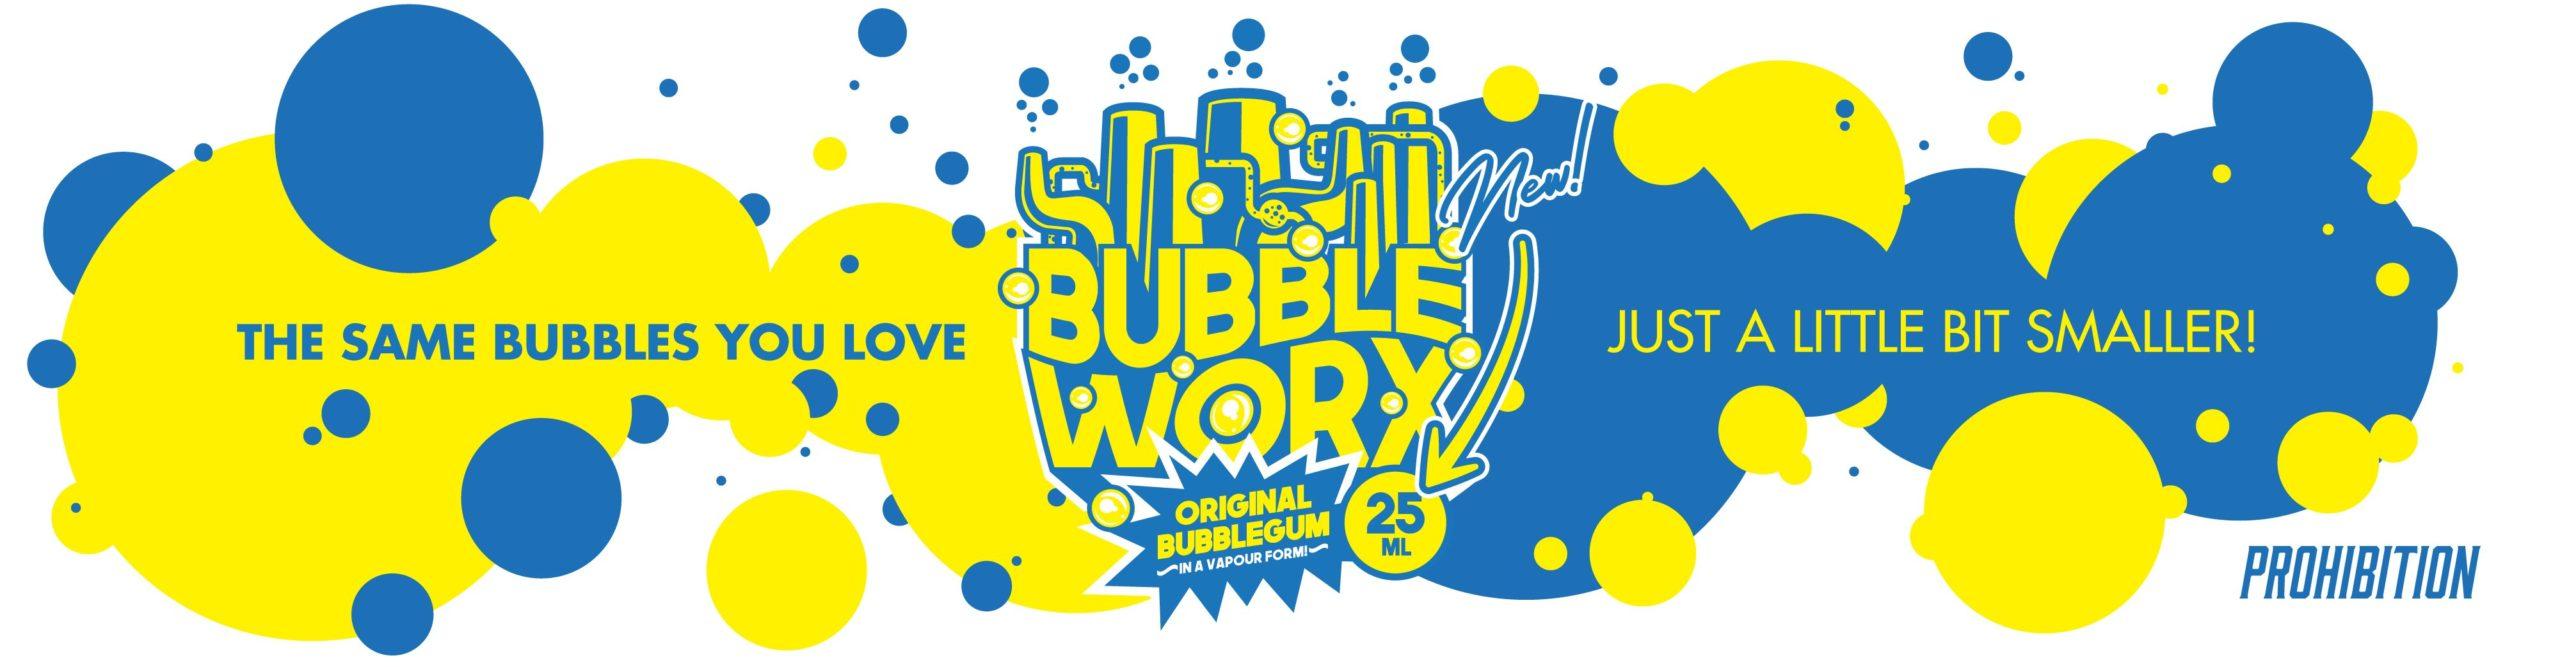 Bubbleworx